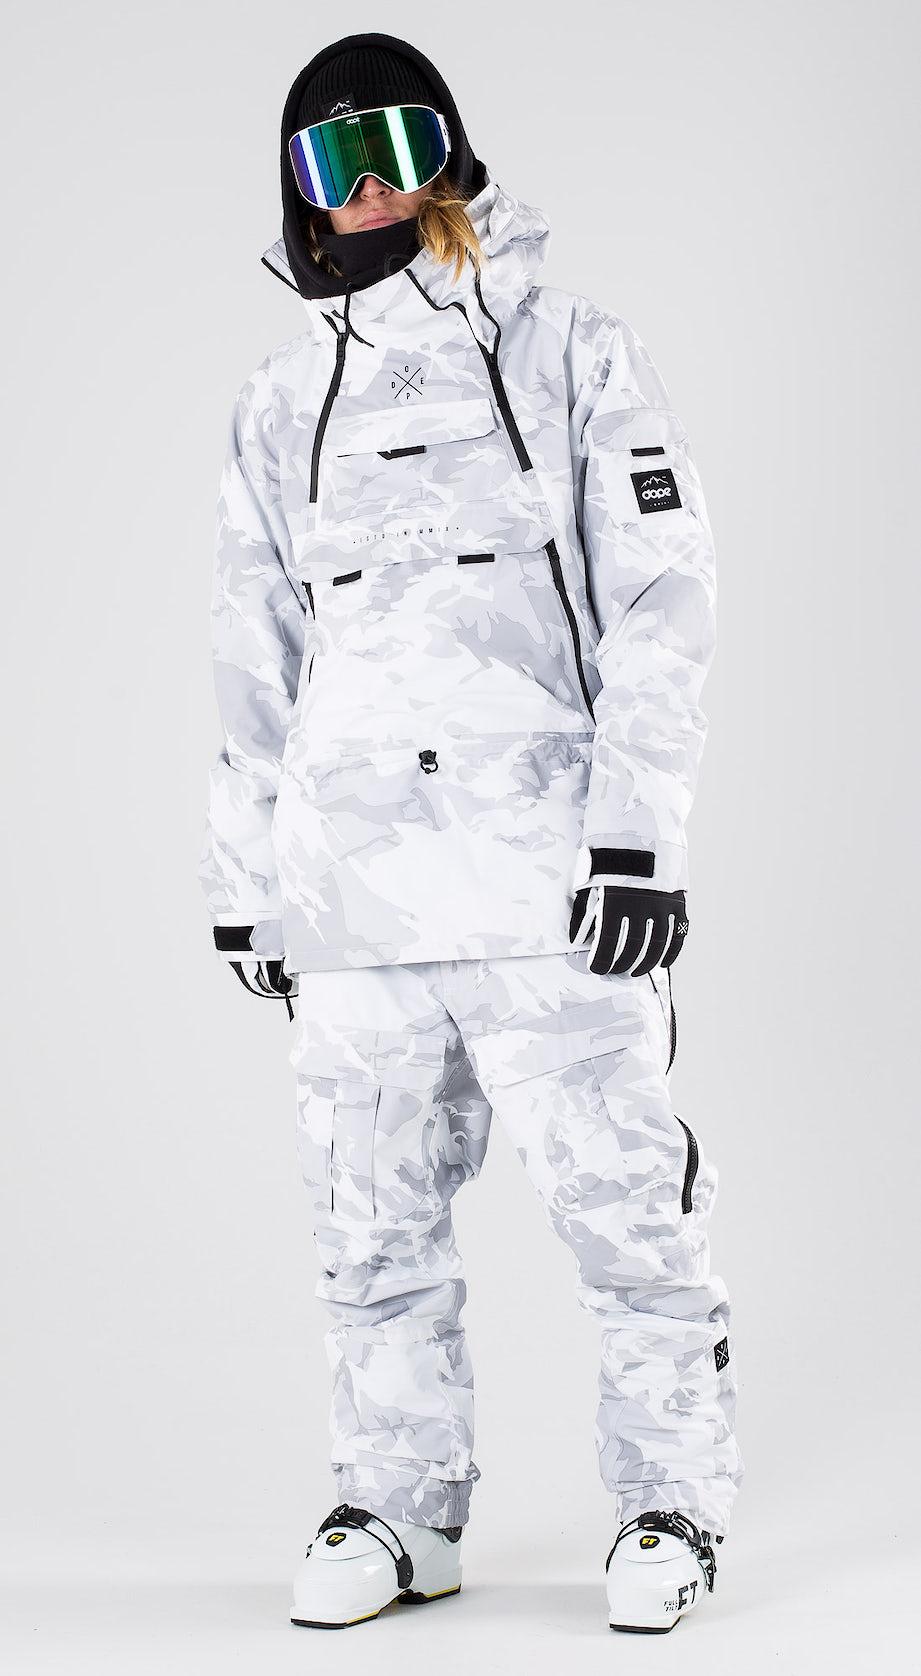 Dope Akin Tux Camo Ski clothing Multi